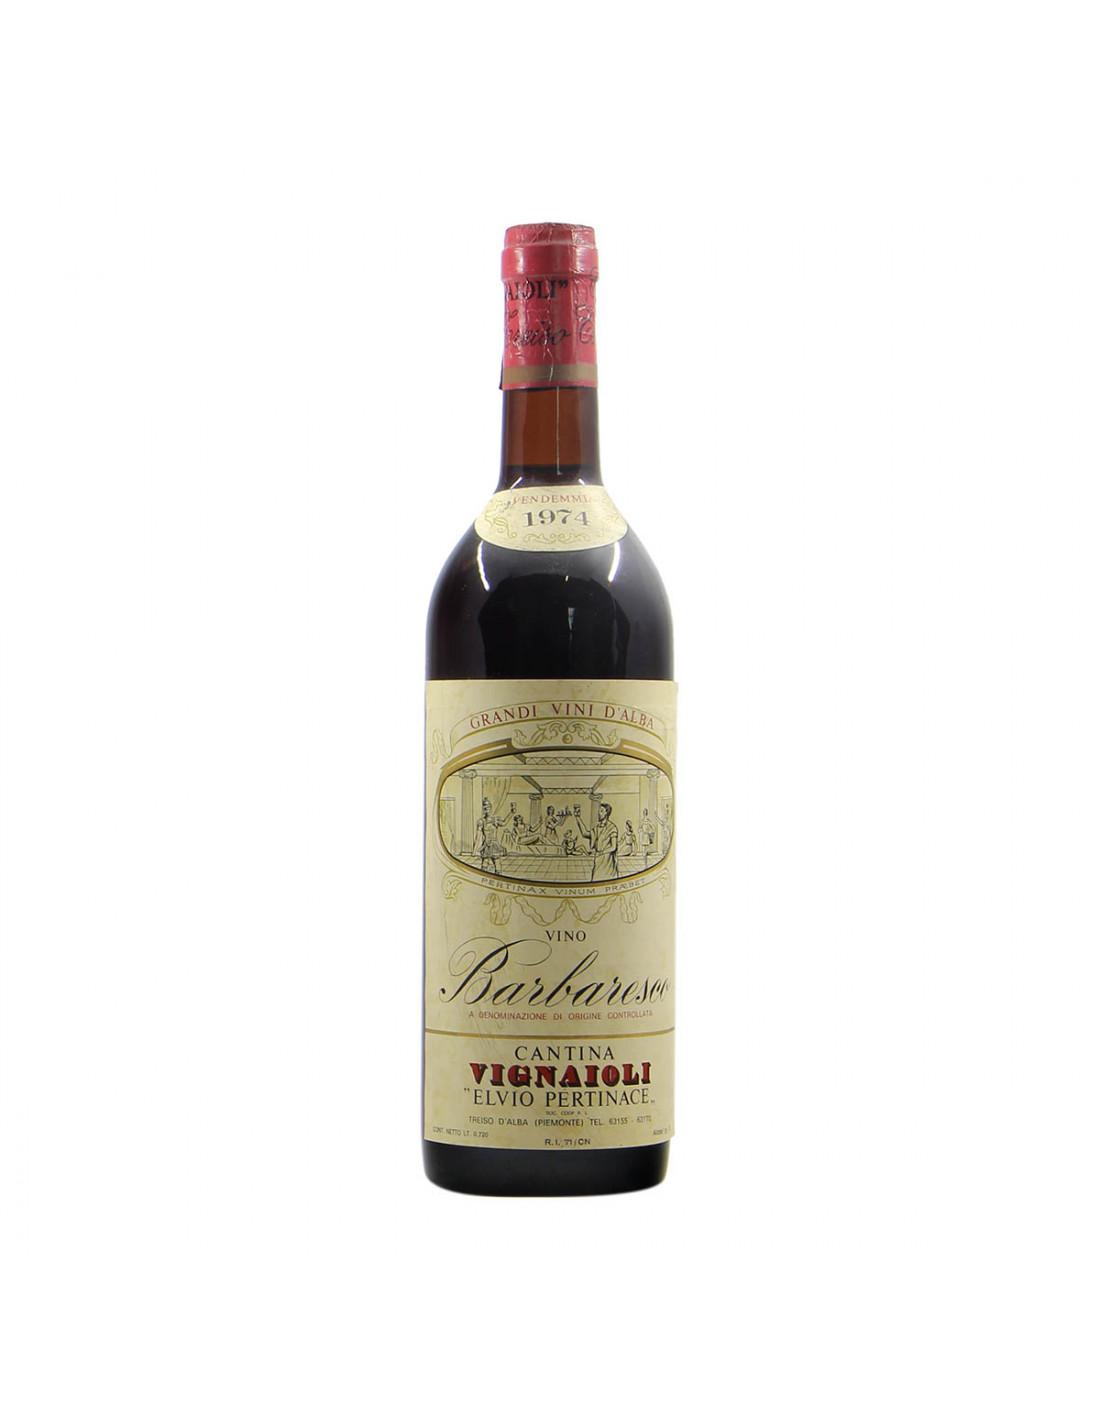 Cantina Vignaioli Elvio Pertinace Barbaresco 1974 Grandi Bottiglie